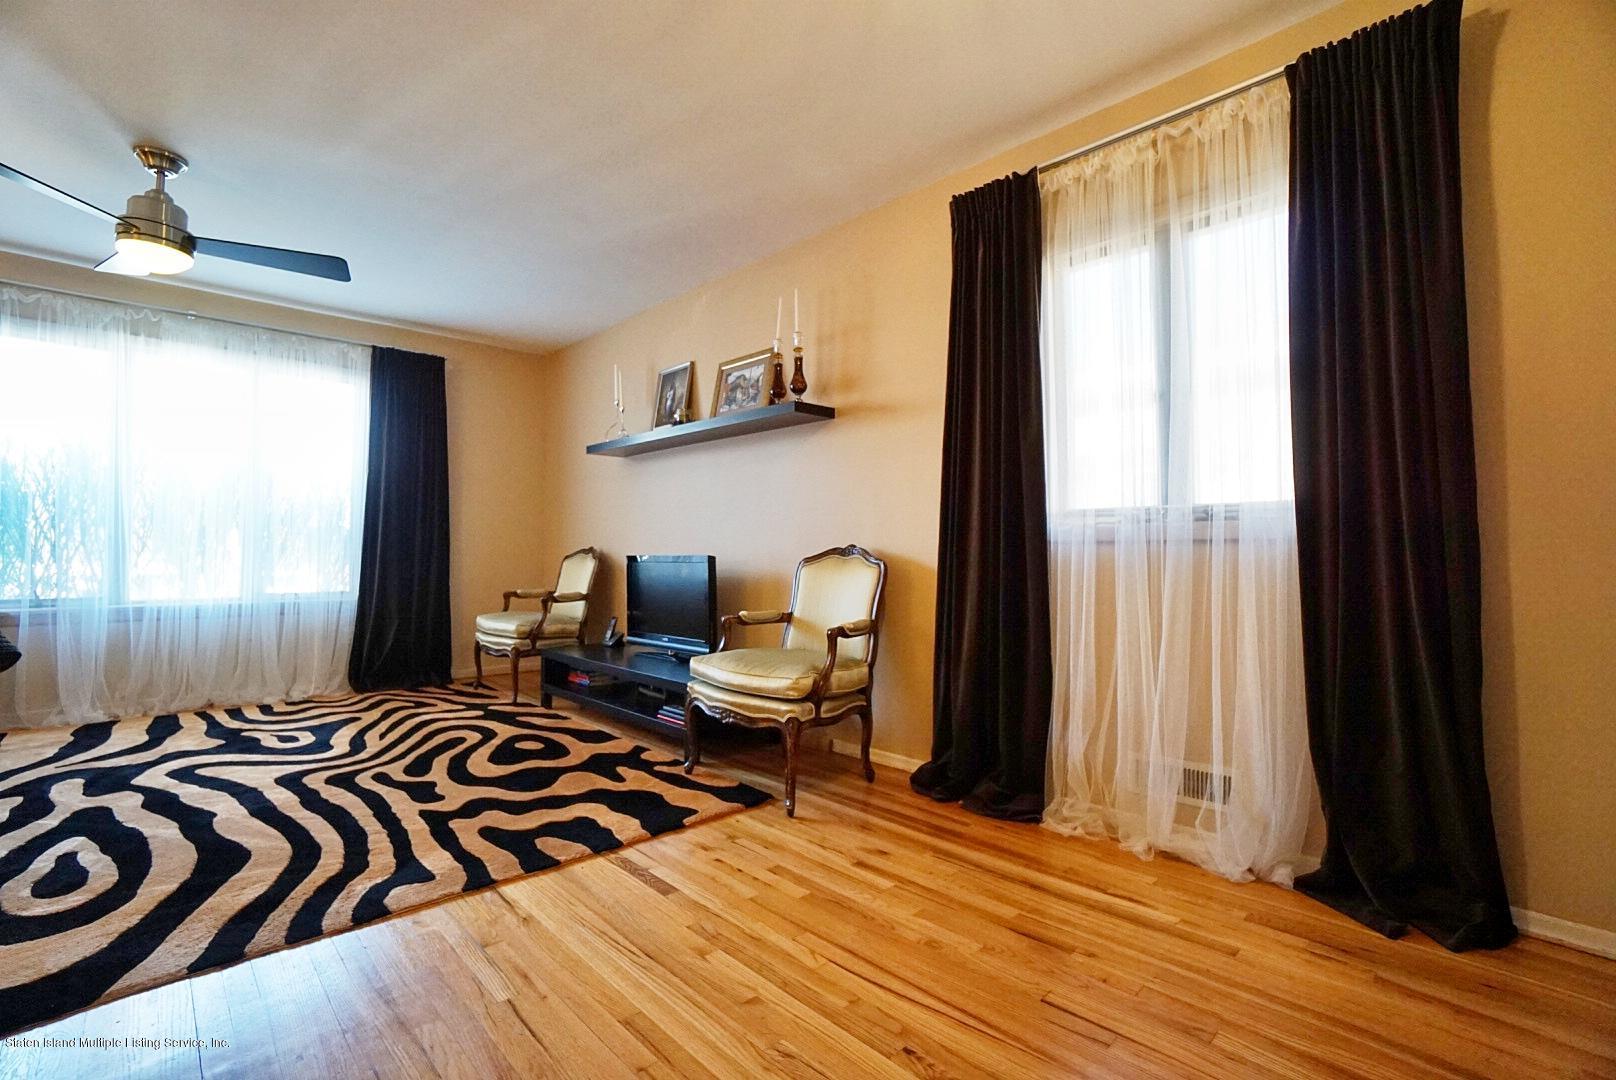 Single Family - Detached 183 Kensington Avenue  Staten Island, NY 10305, MLS-1127107-19